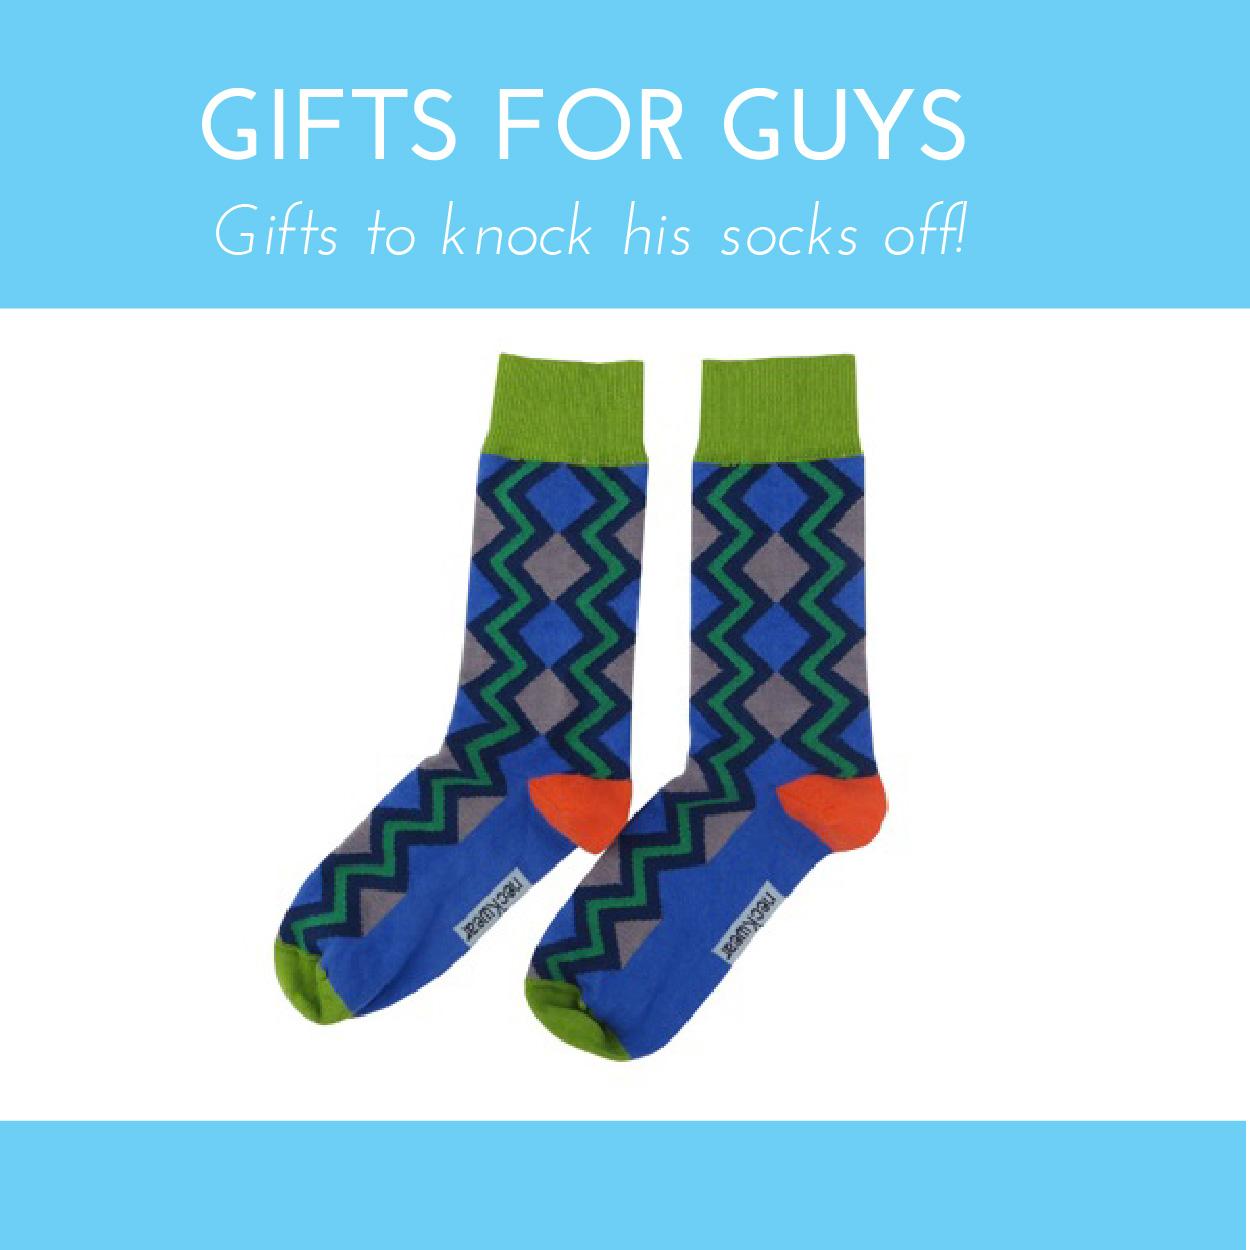 gifts-for-guys-01.jpg